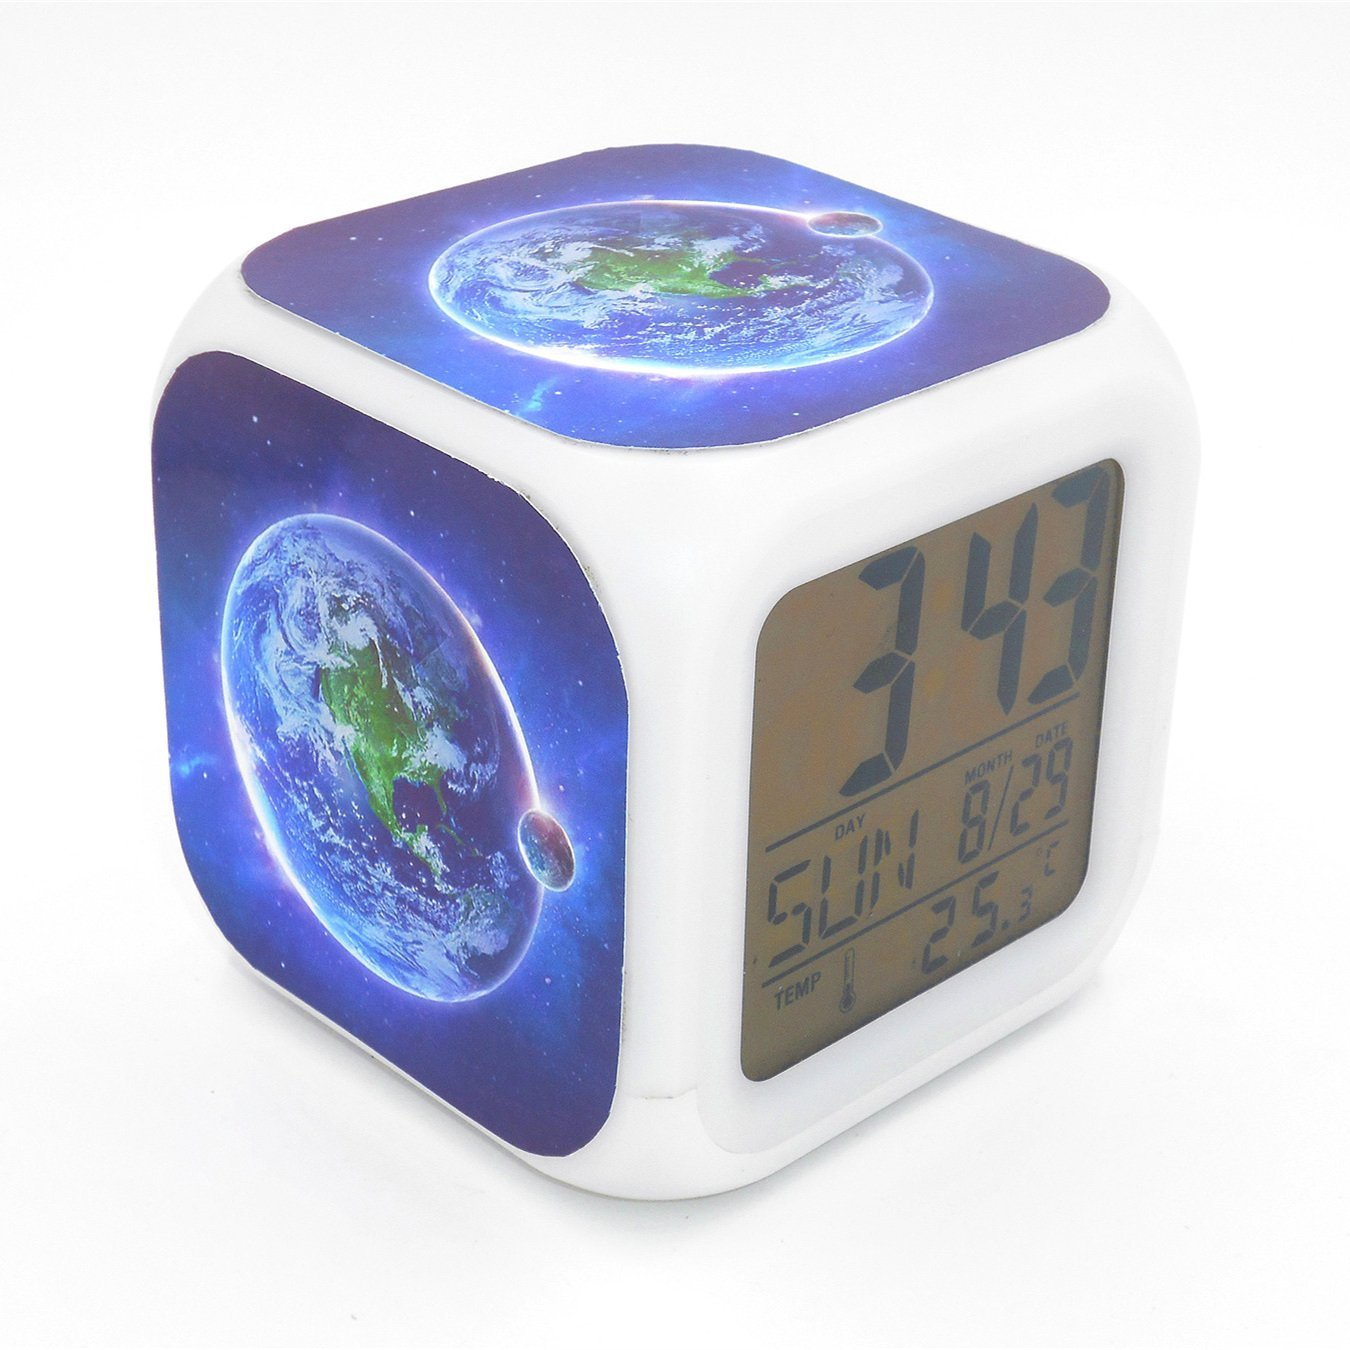 Boyan Led Alarm Clock Blue Earth Moon Creative Desk Table Clock Glowing Electric Led Digital Alarm Clock Kids Toy Gift